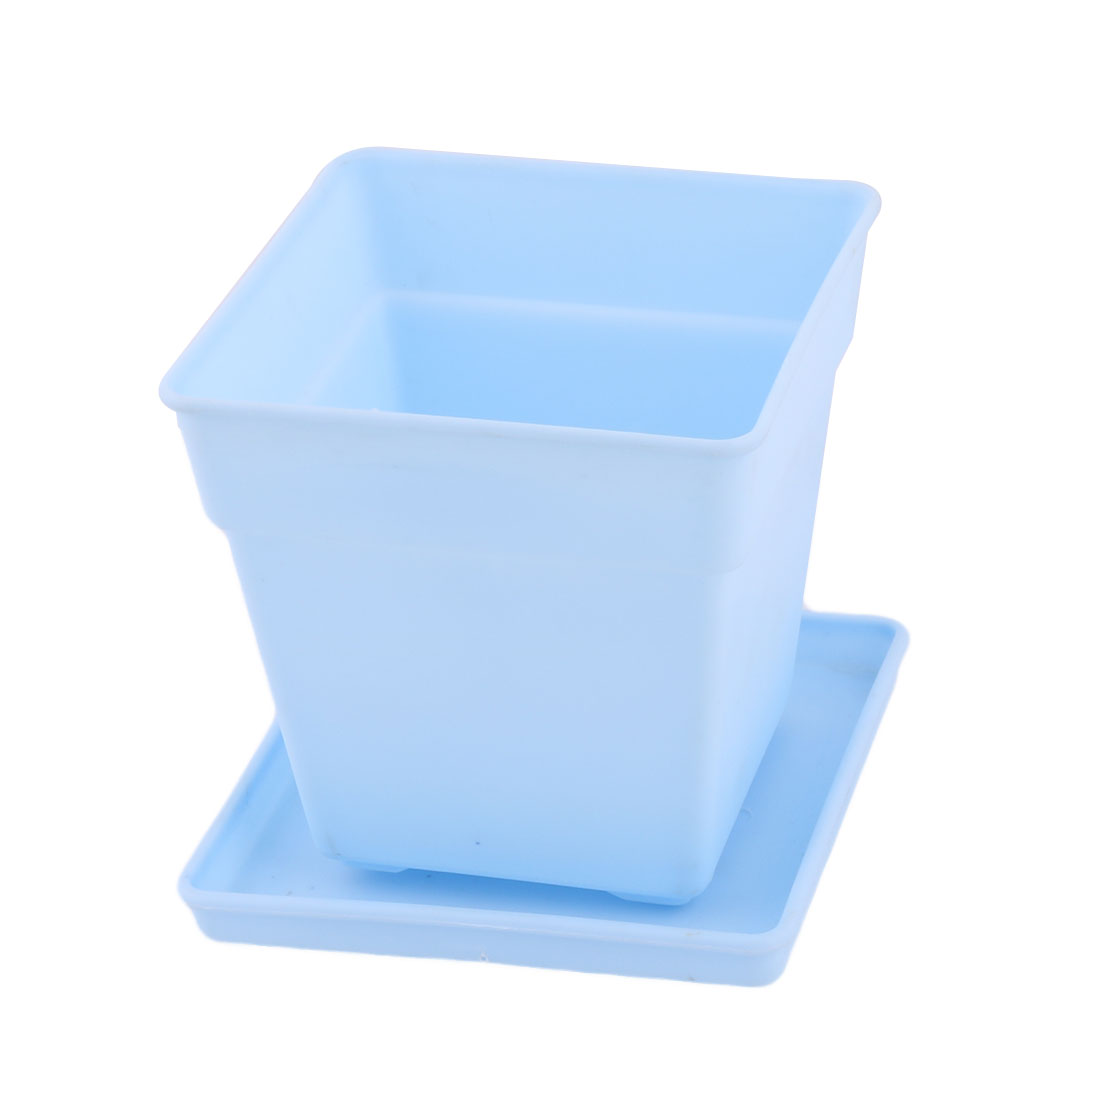 Desktop Decor Plastic Square Flower Plant Pot Tray Holder Container Light Blue